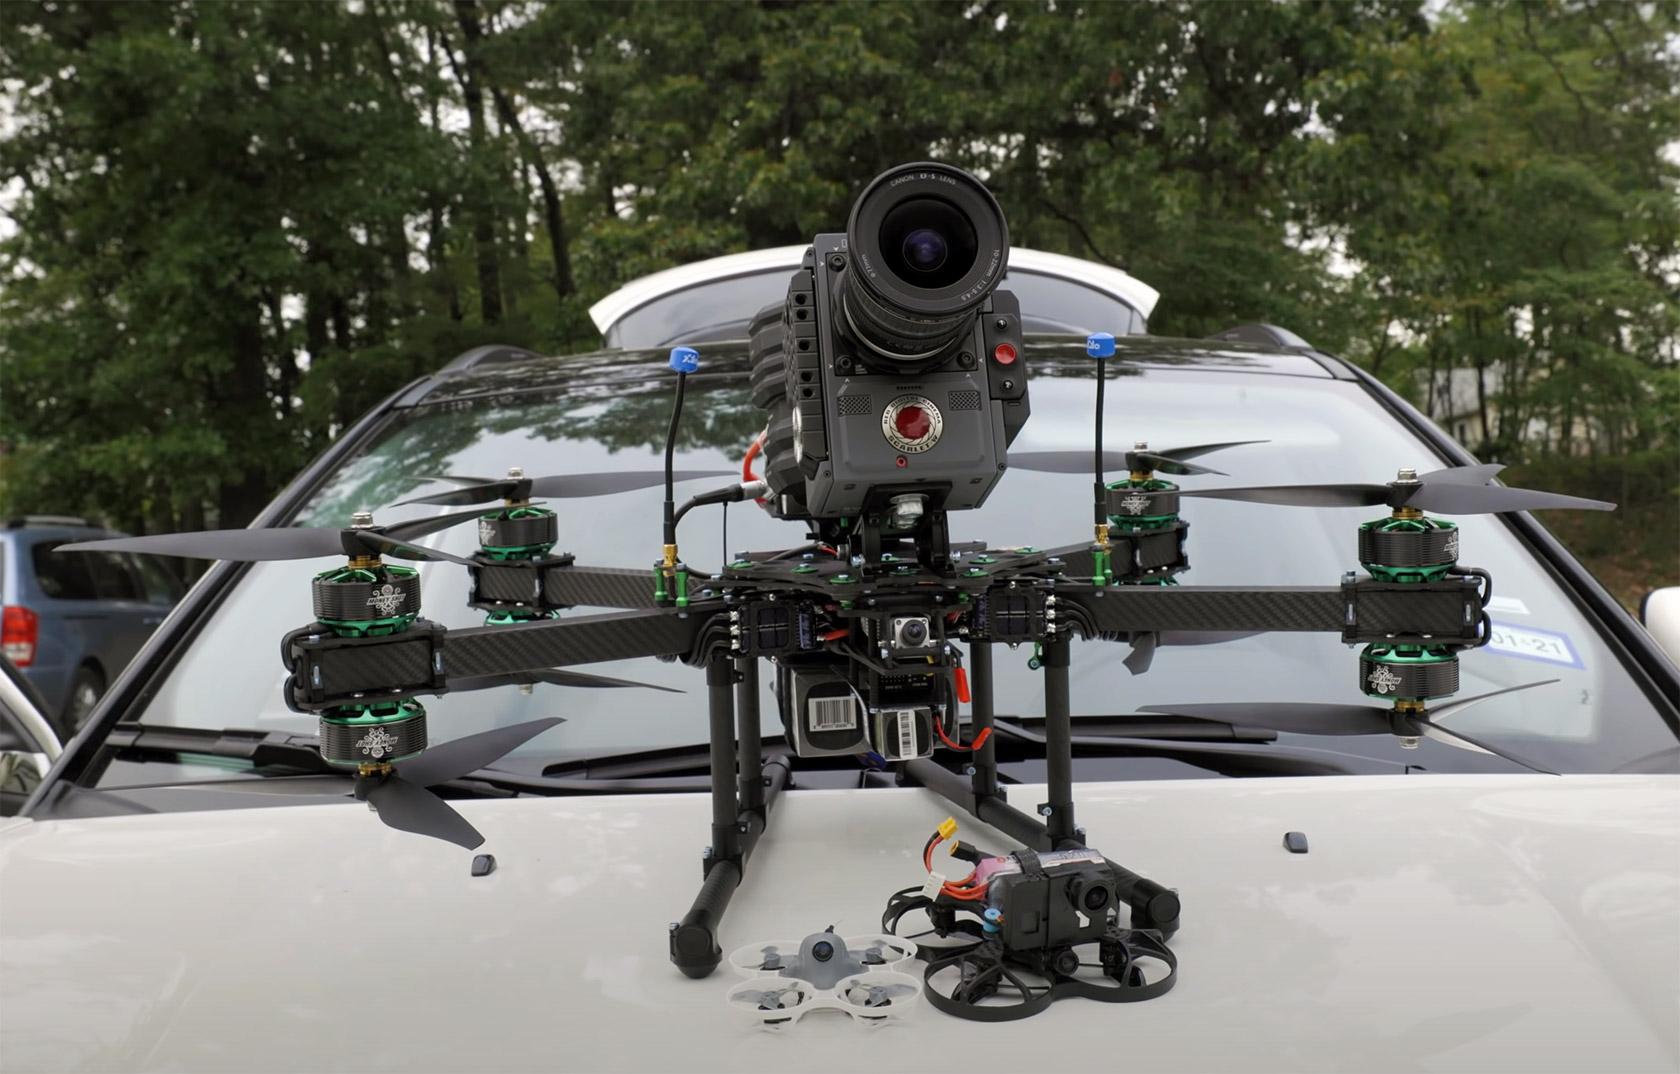 RED Cinema Camera FPV Racing Drone